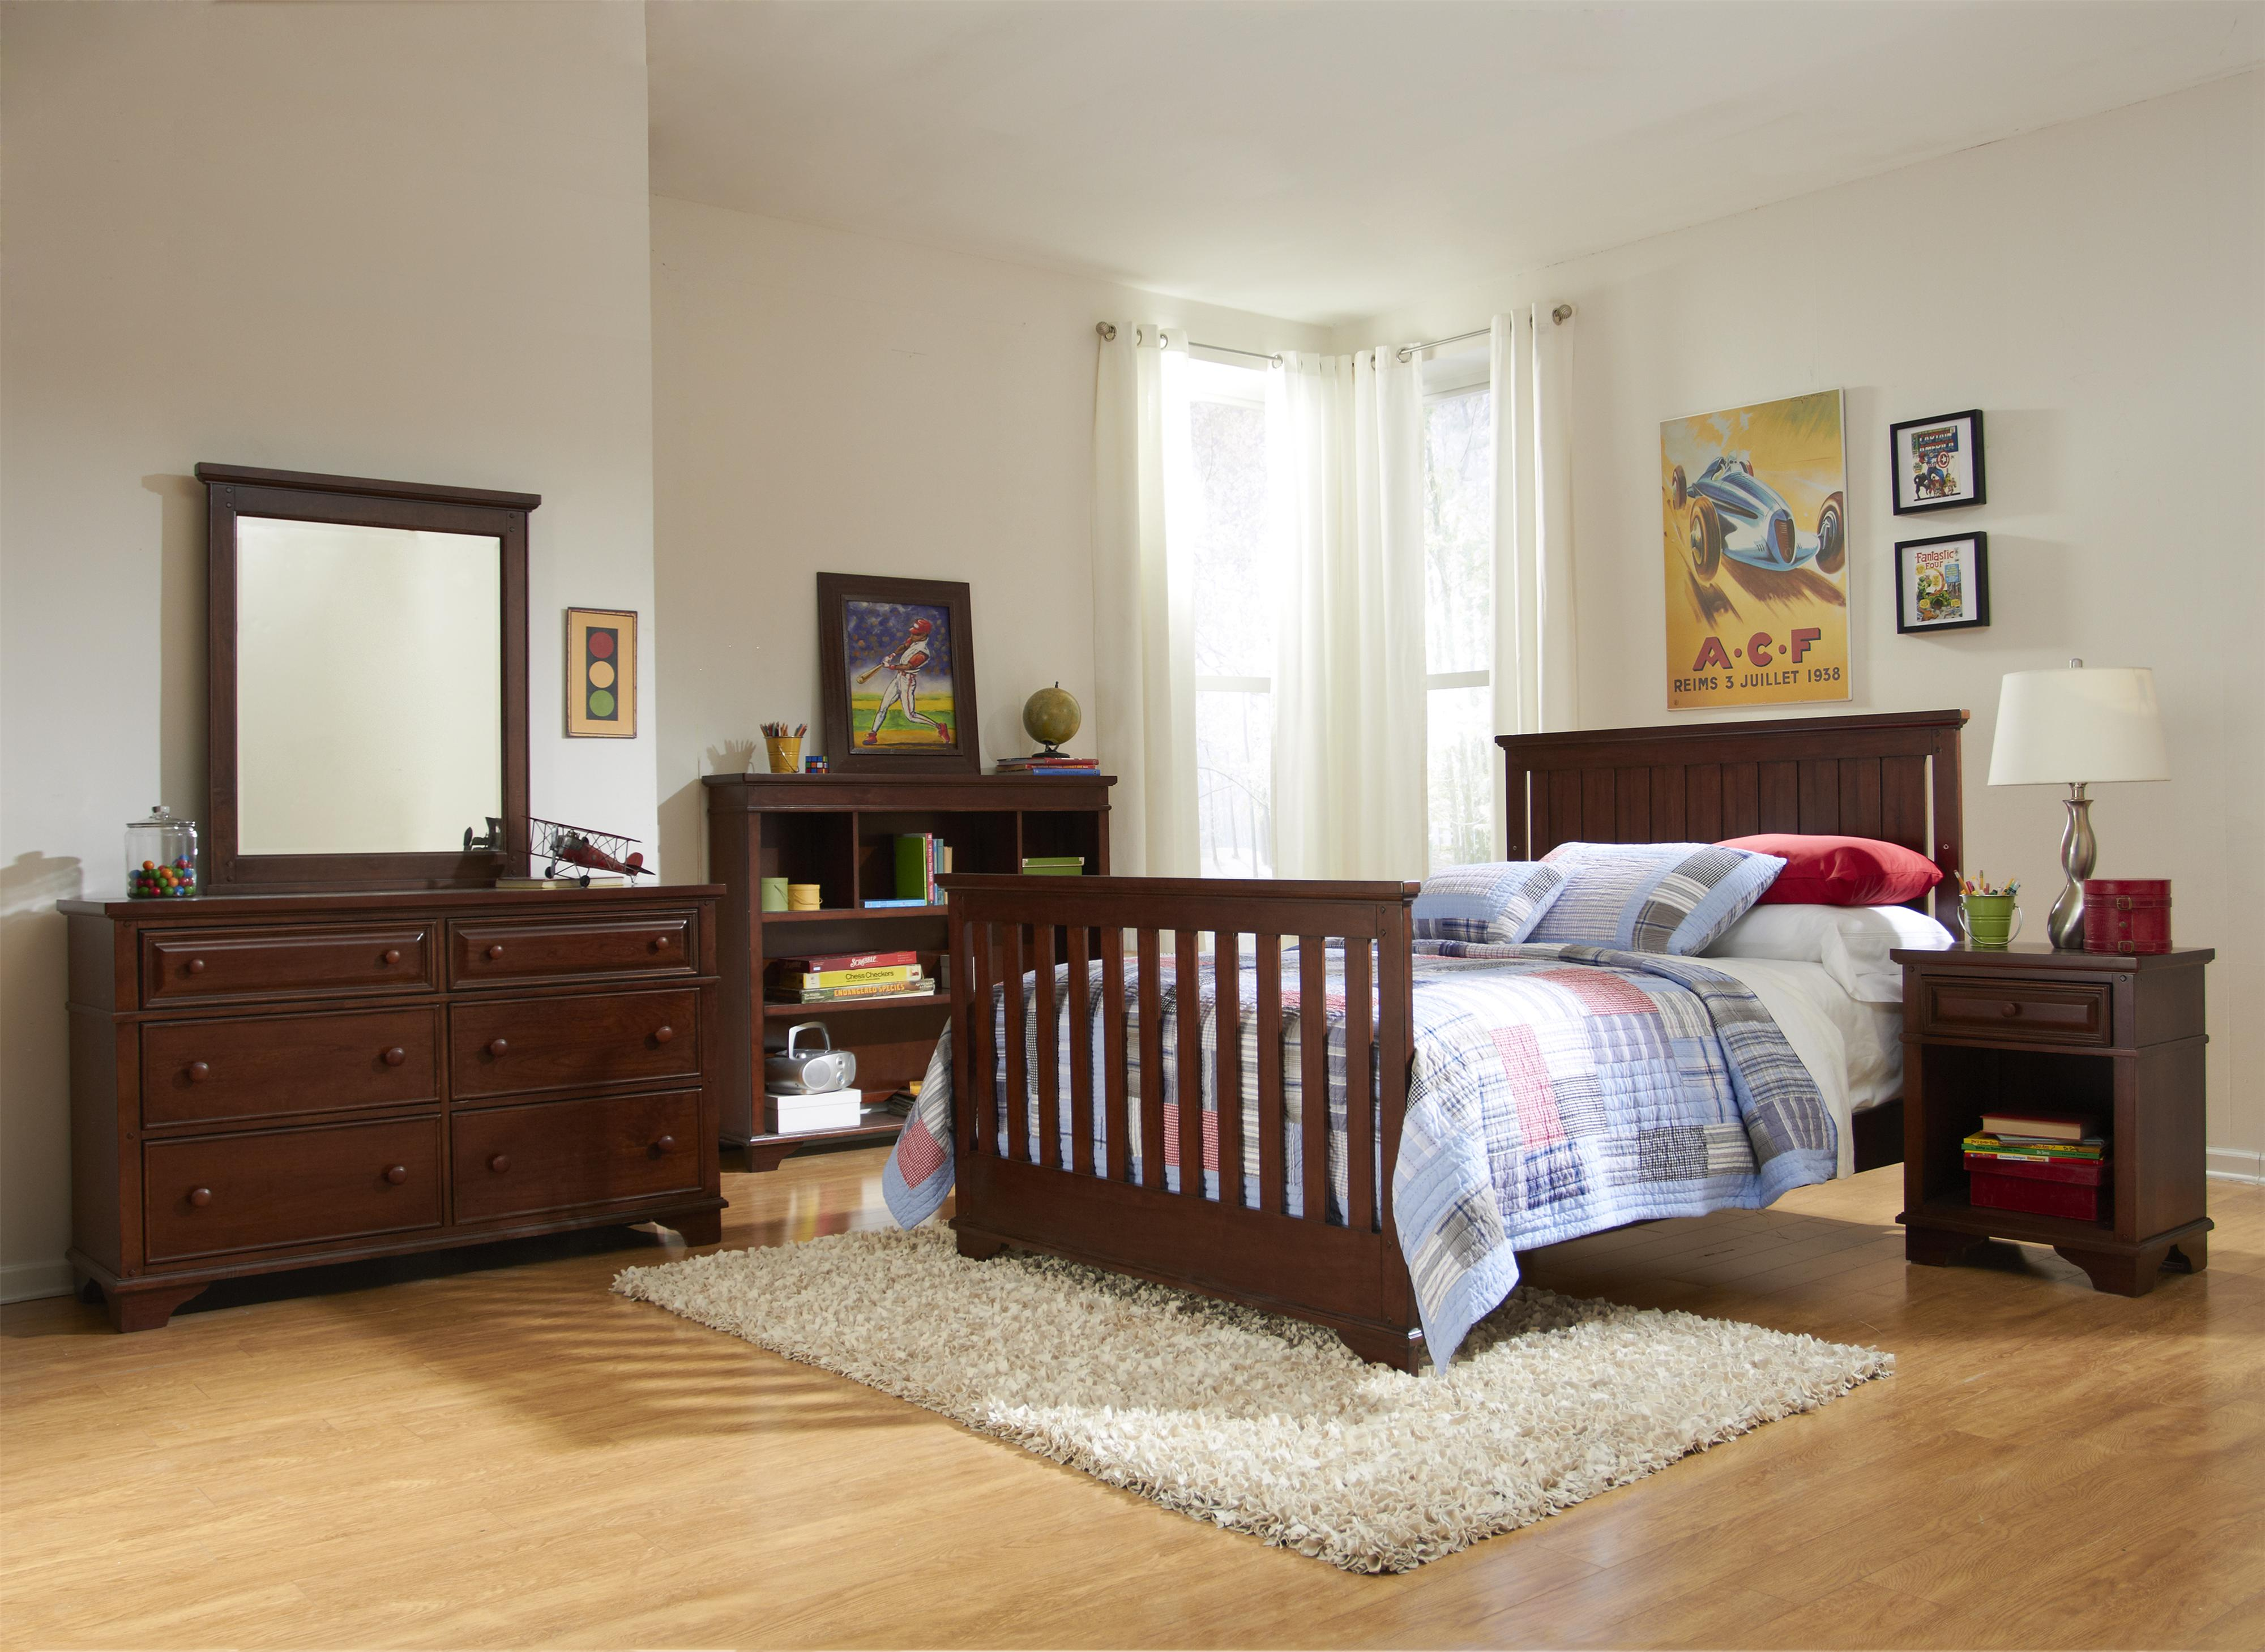 Legacy Classic Kids Dawsons Ridge Crib Bedroom Group - Item Number: 2960 C Bedroom Group 2